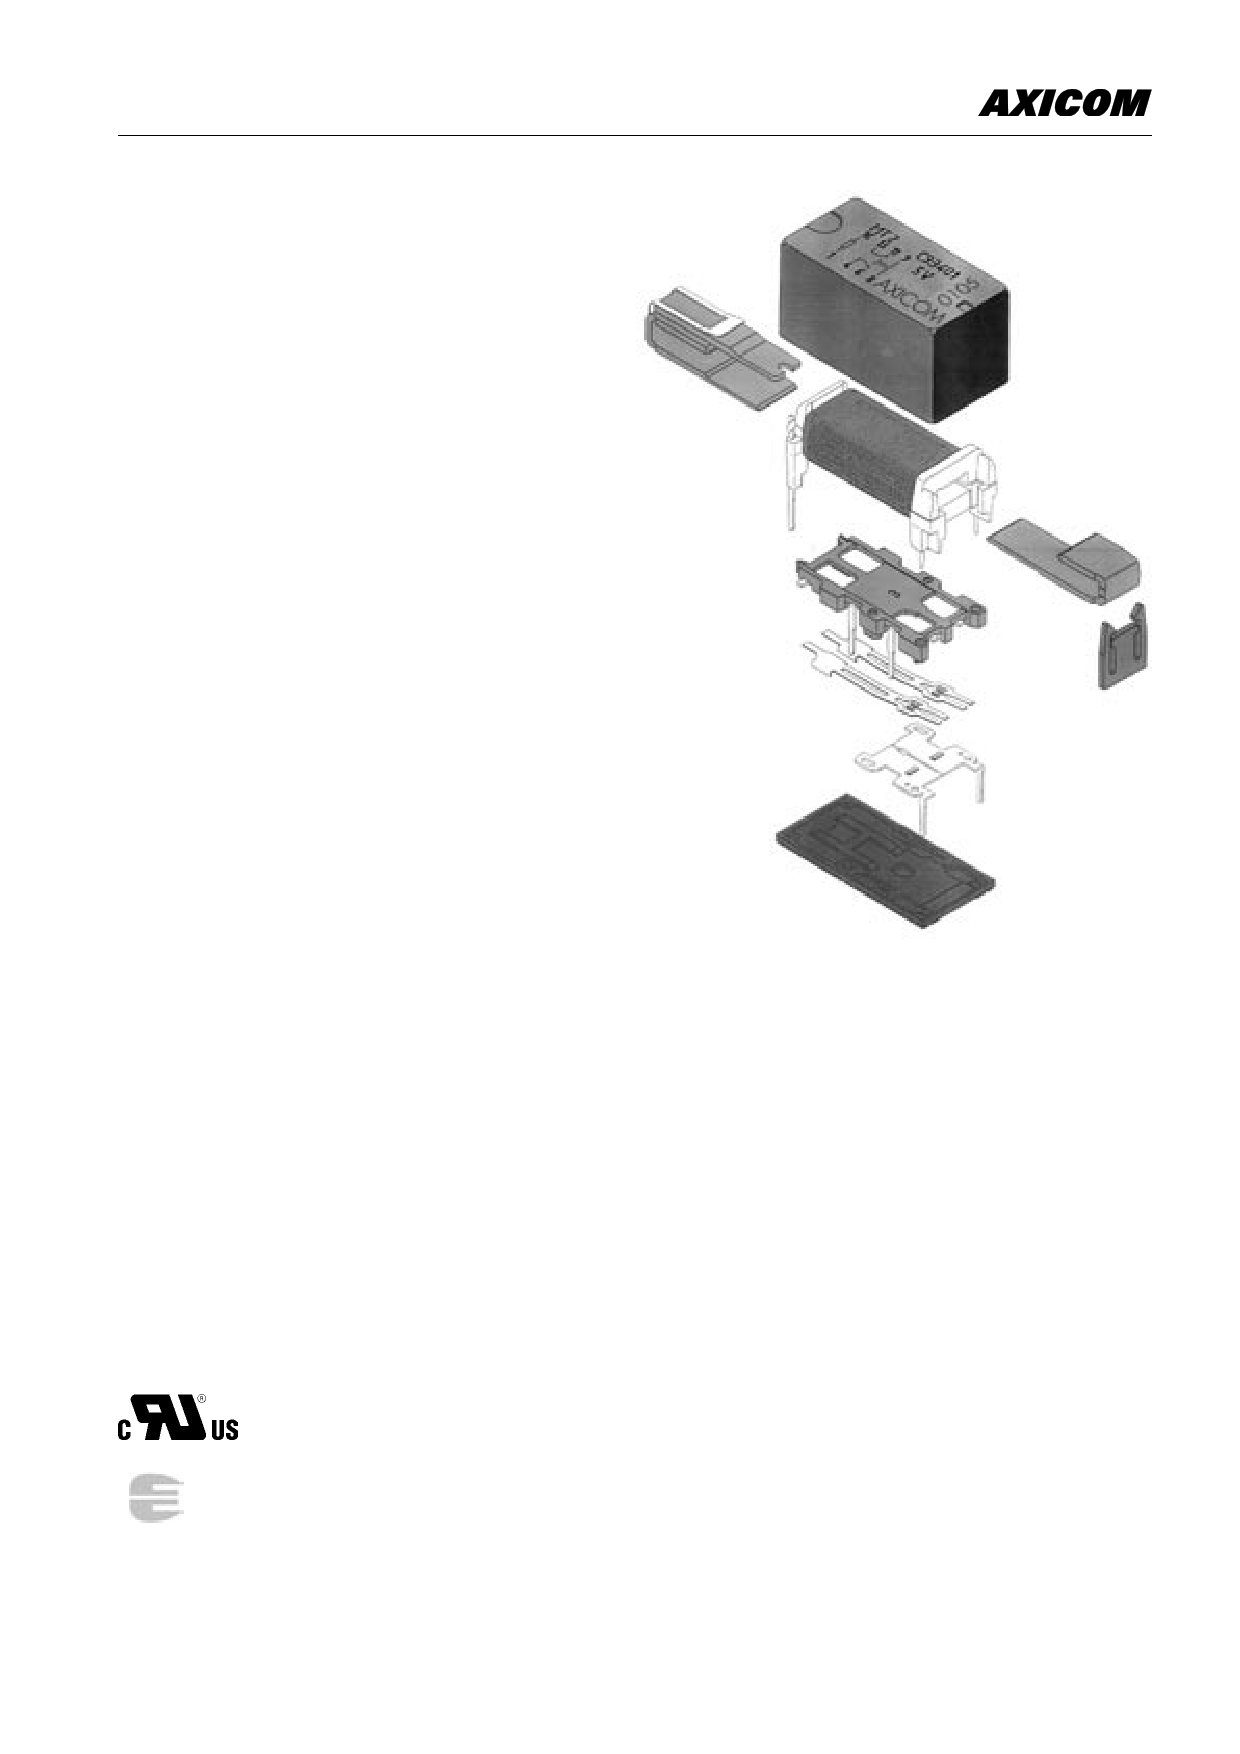 3-1462000-1 Даташит, Описание, Даташиты